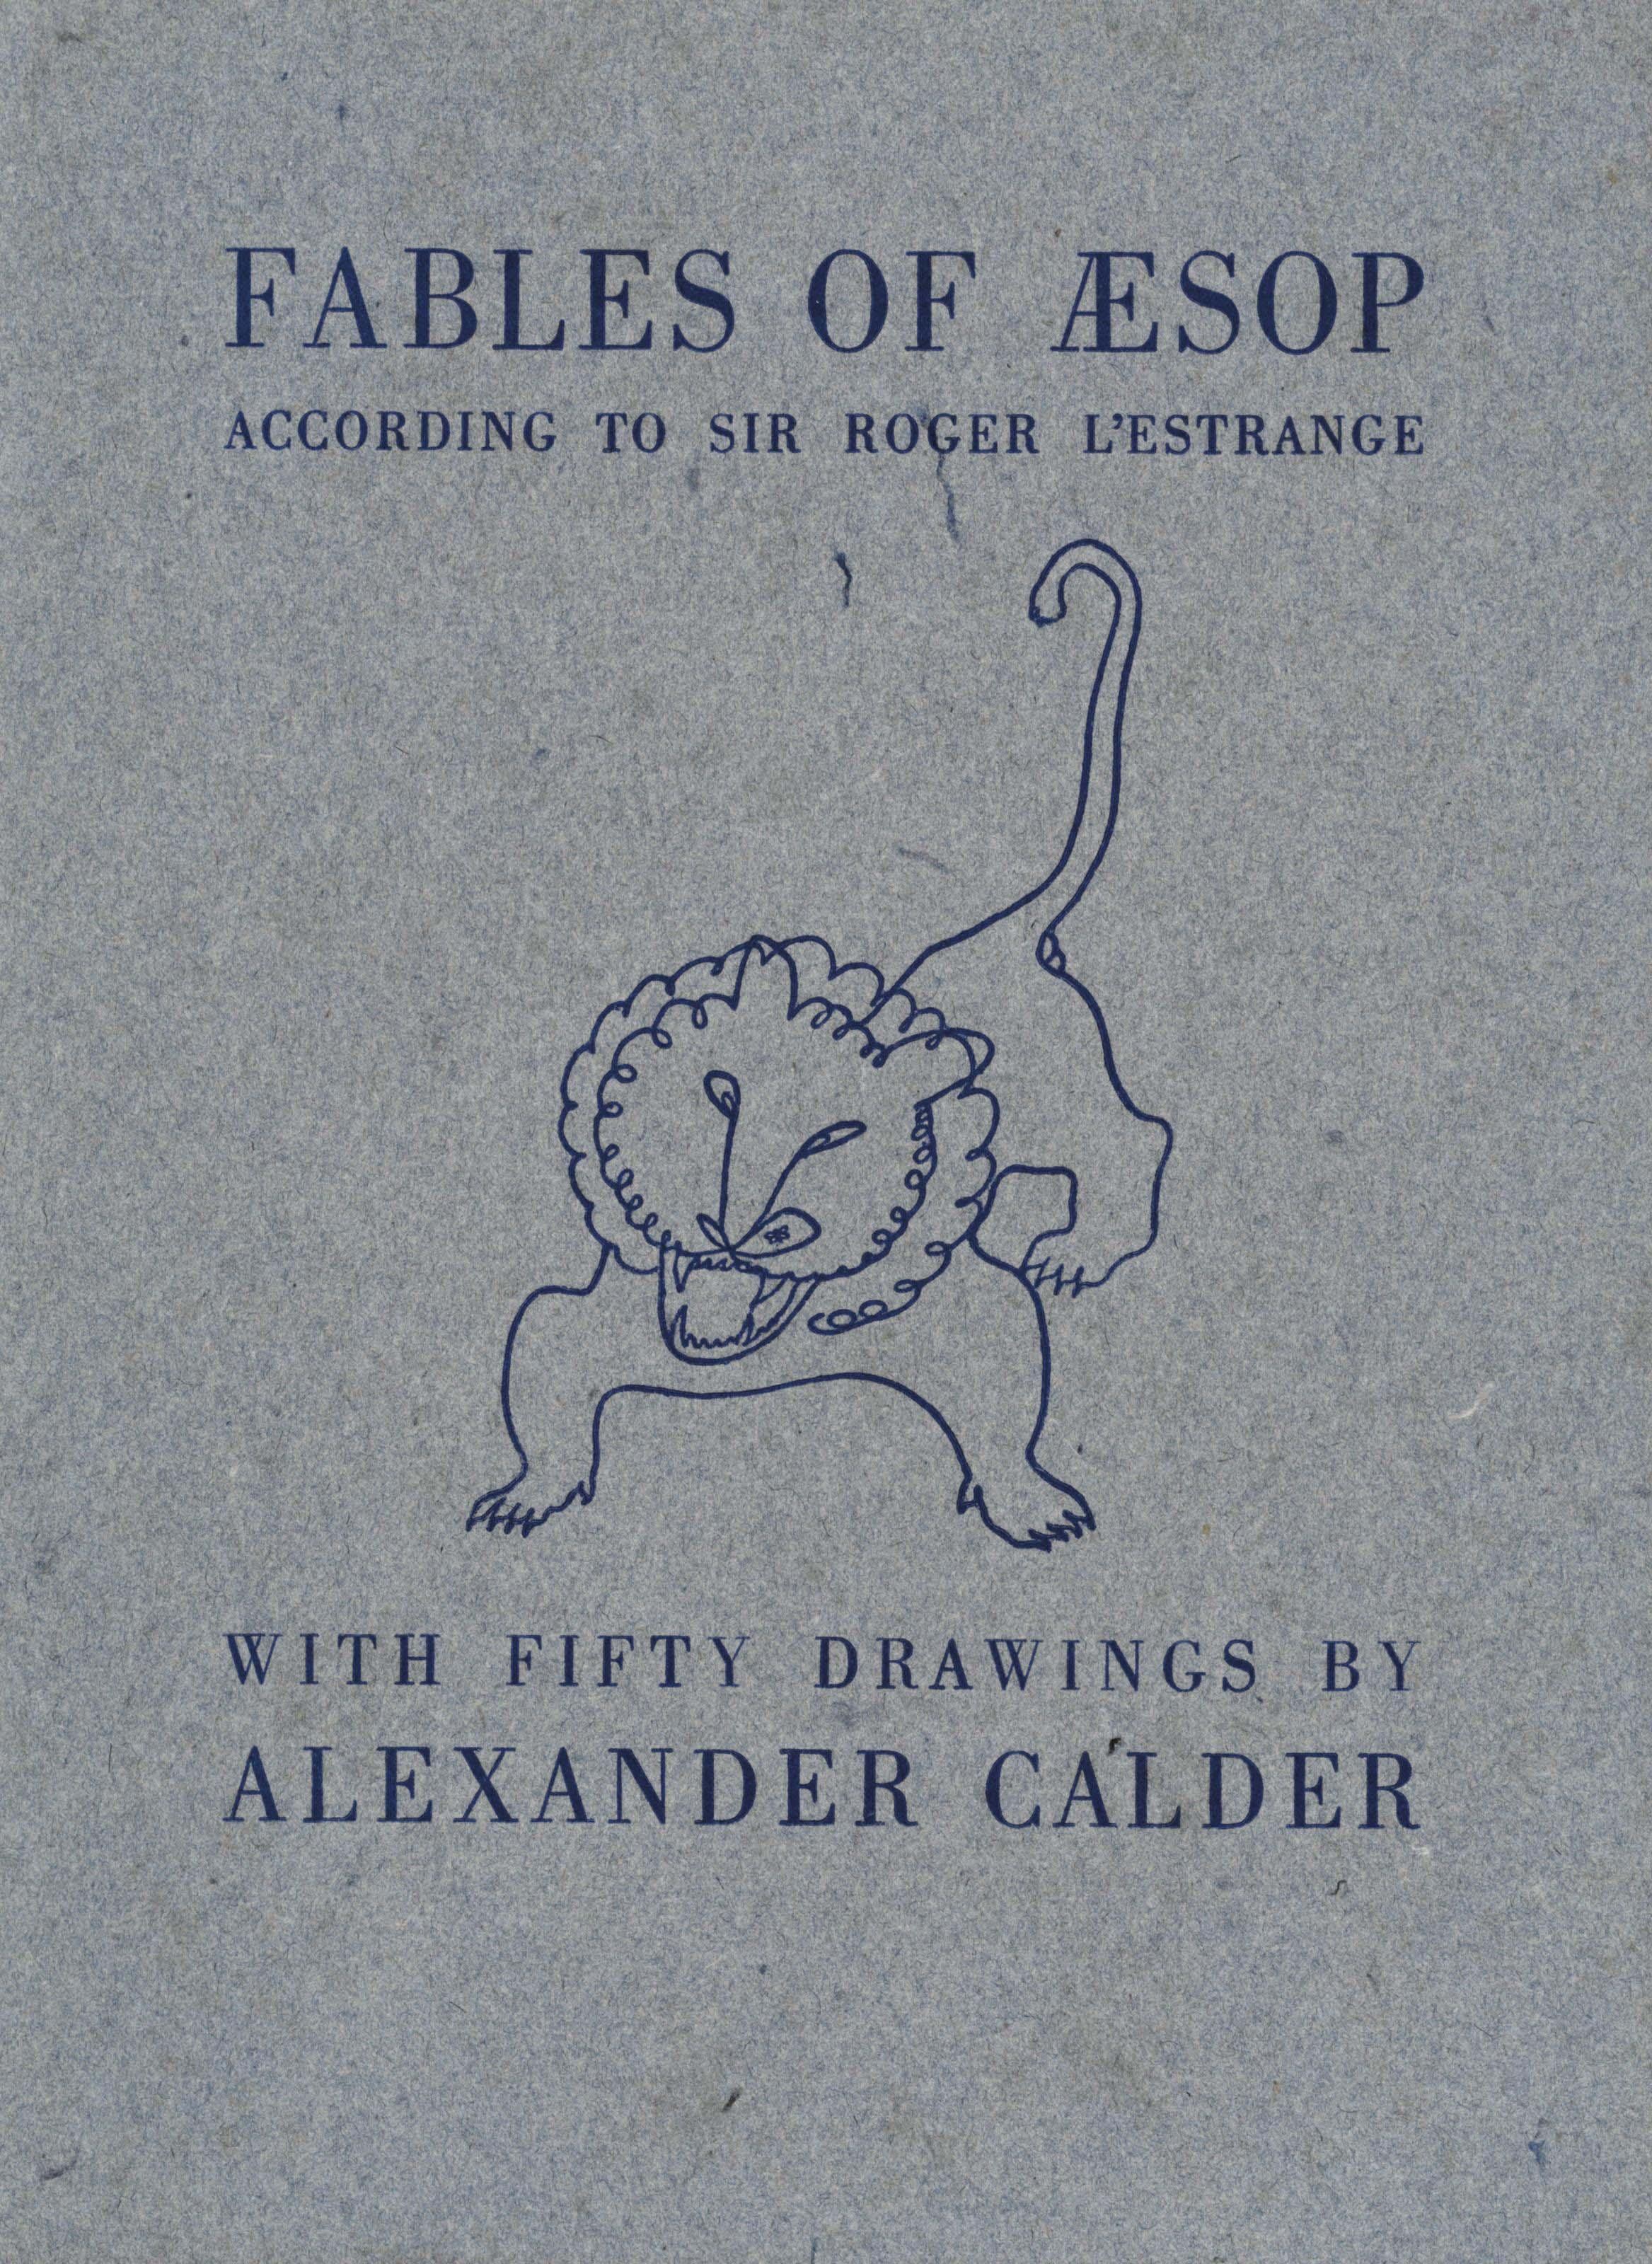 CALDER, Alexander (1898-1976), illustrator -- AESOP (ca 620-560 B.C.). Fables... according to Sir Roger L'Estrange. New York: Harrison of Paris, 1931.